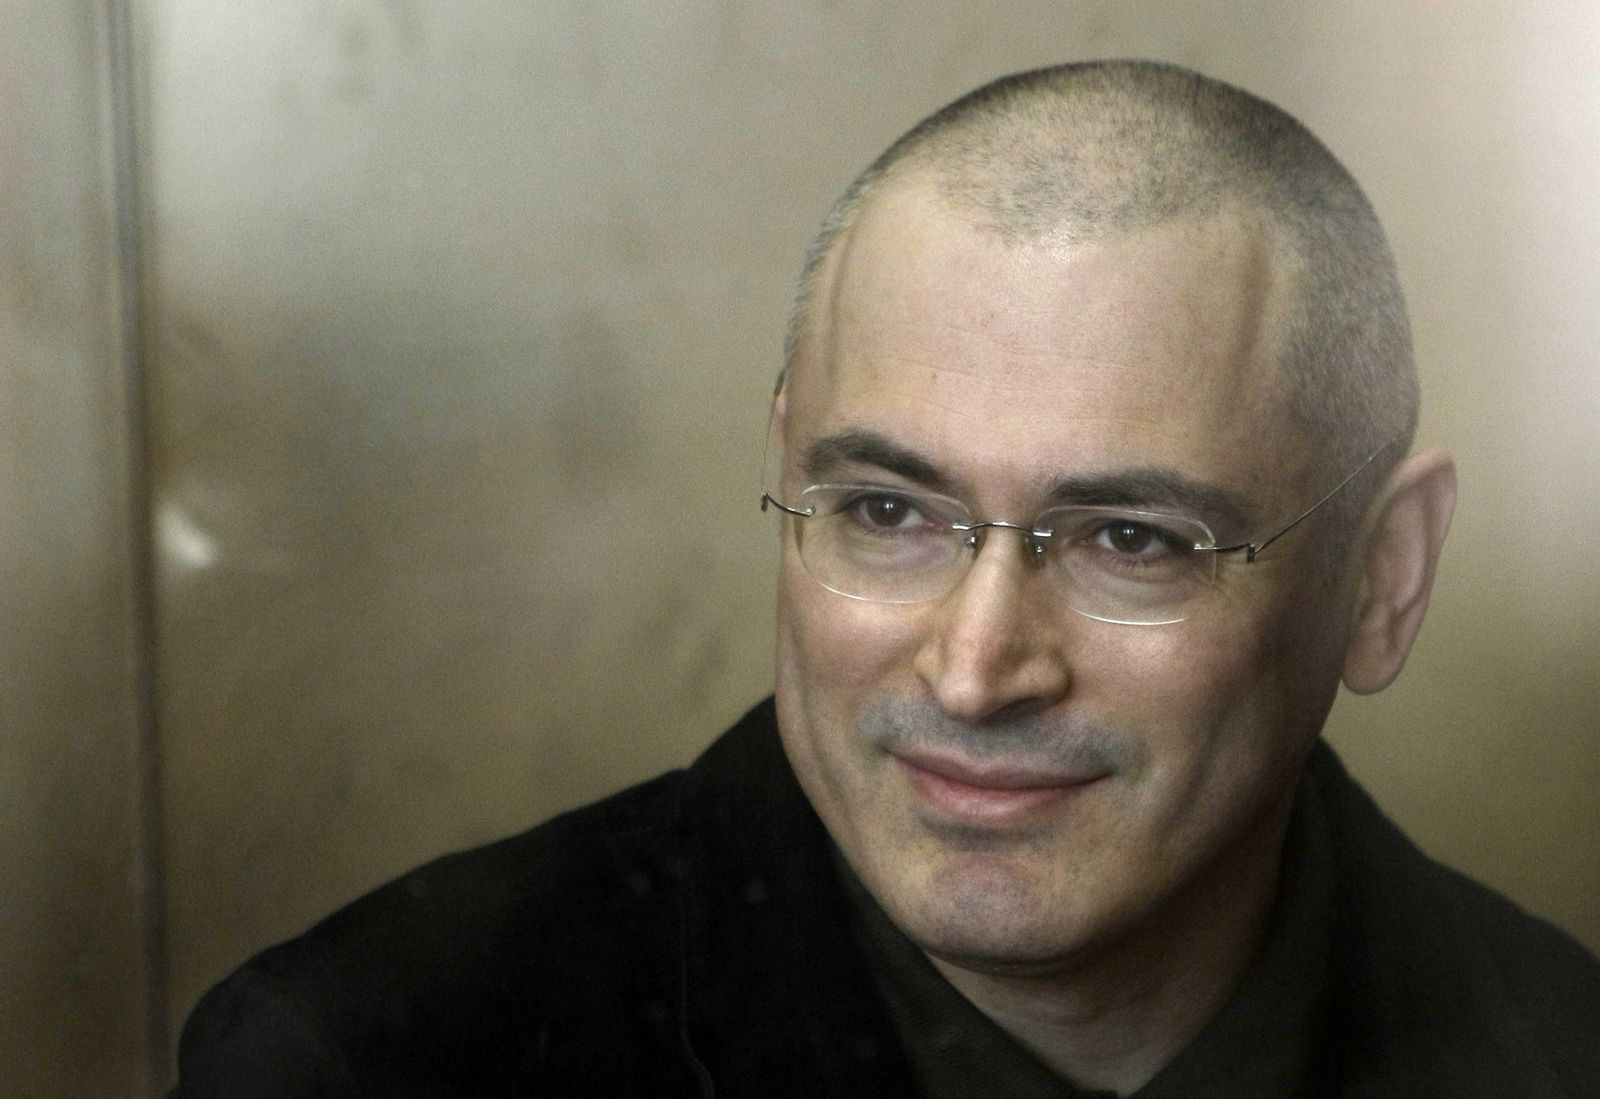 THEMEN Michail Chodorkowski